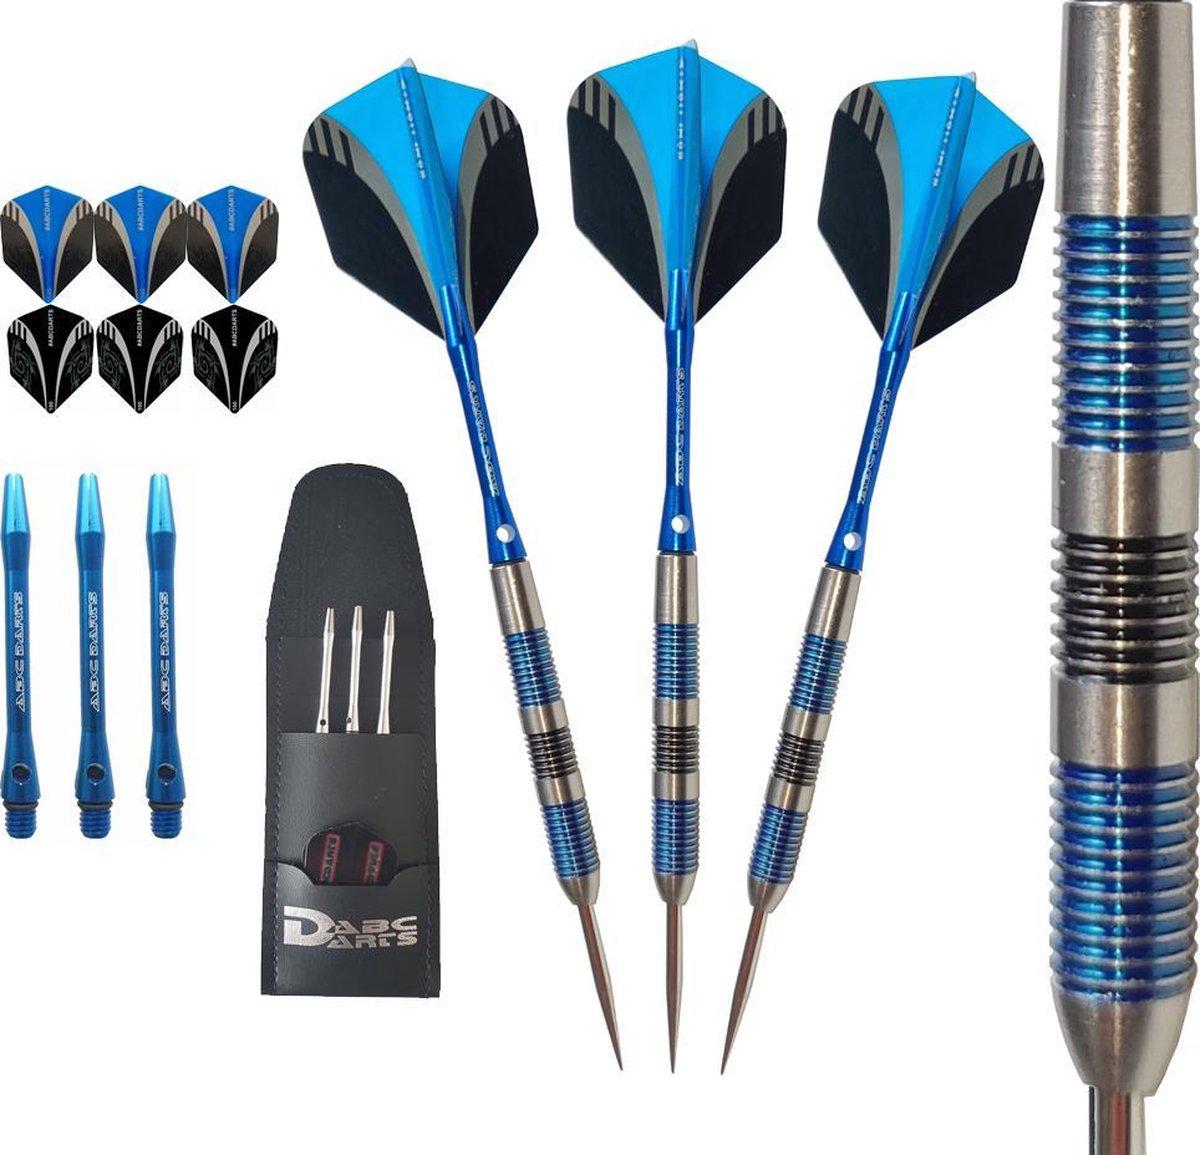 ABC Darts - Professionele Dartpijlen - Originals Blue Jack Tonners - 24 gram